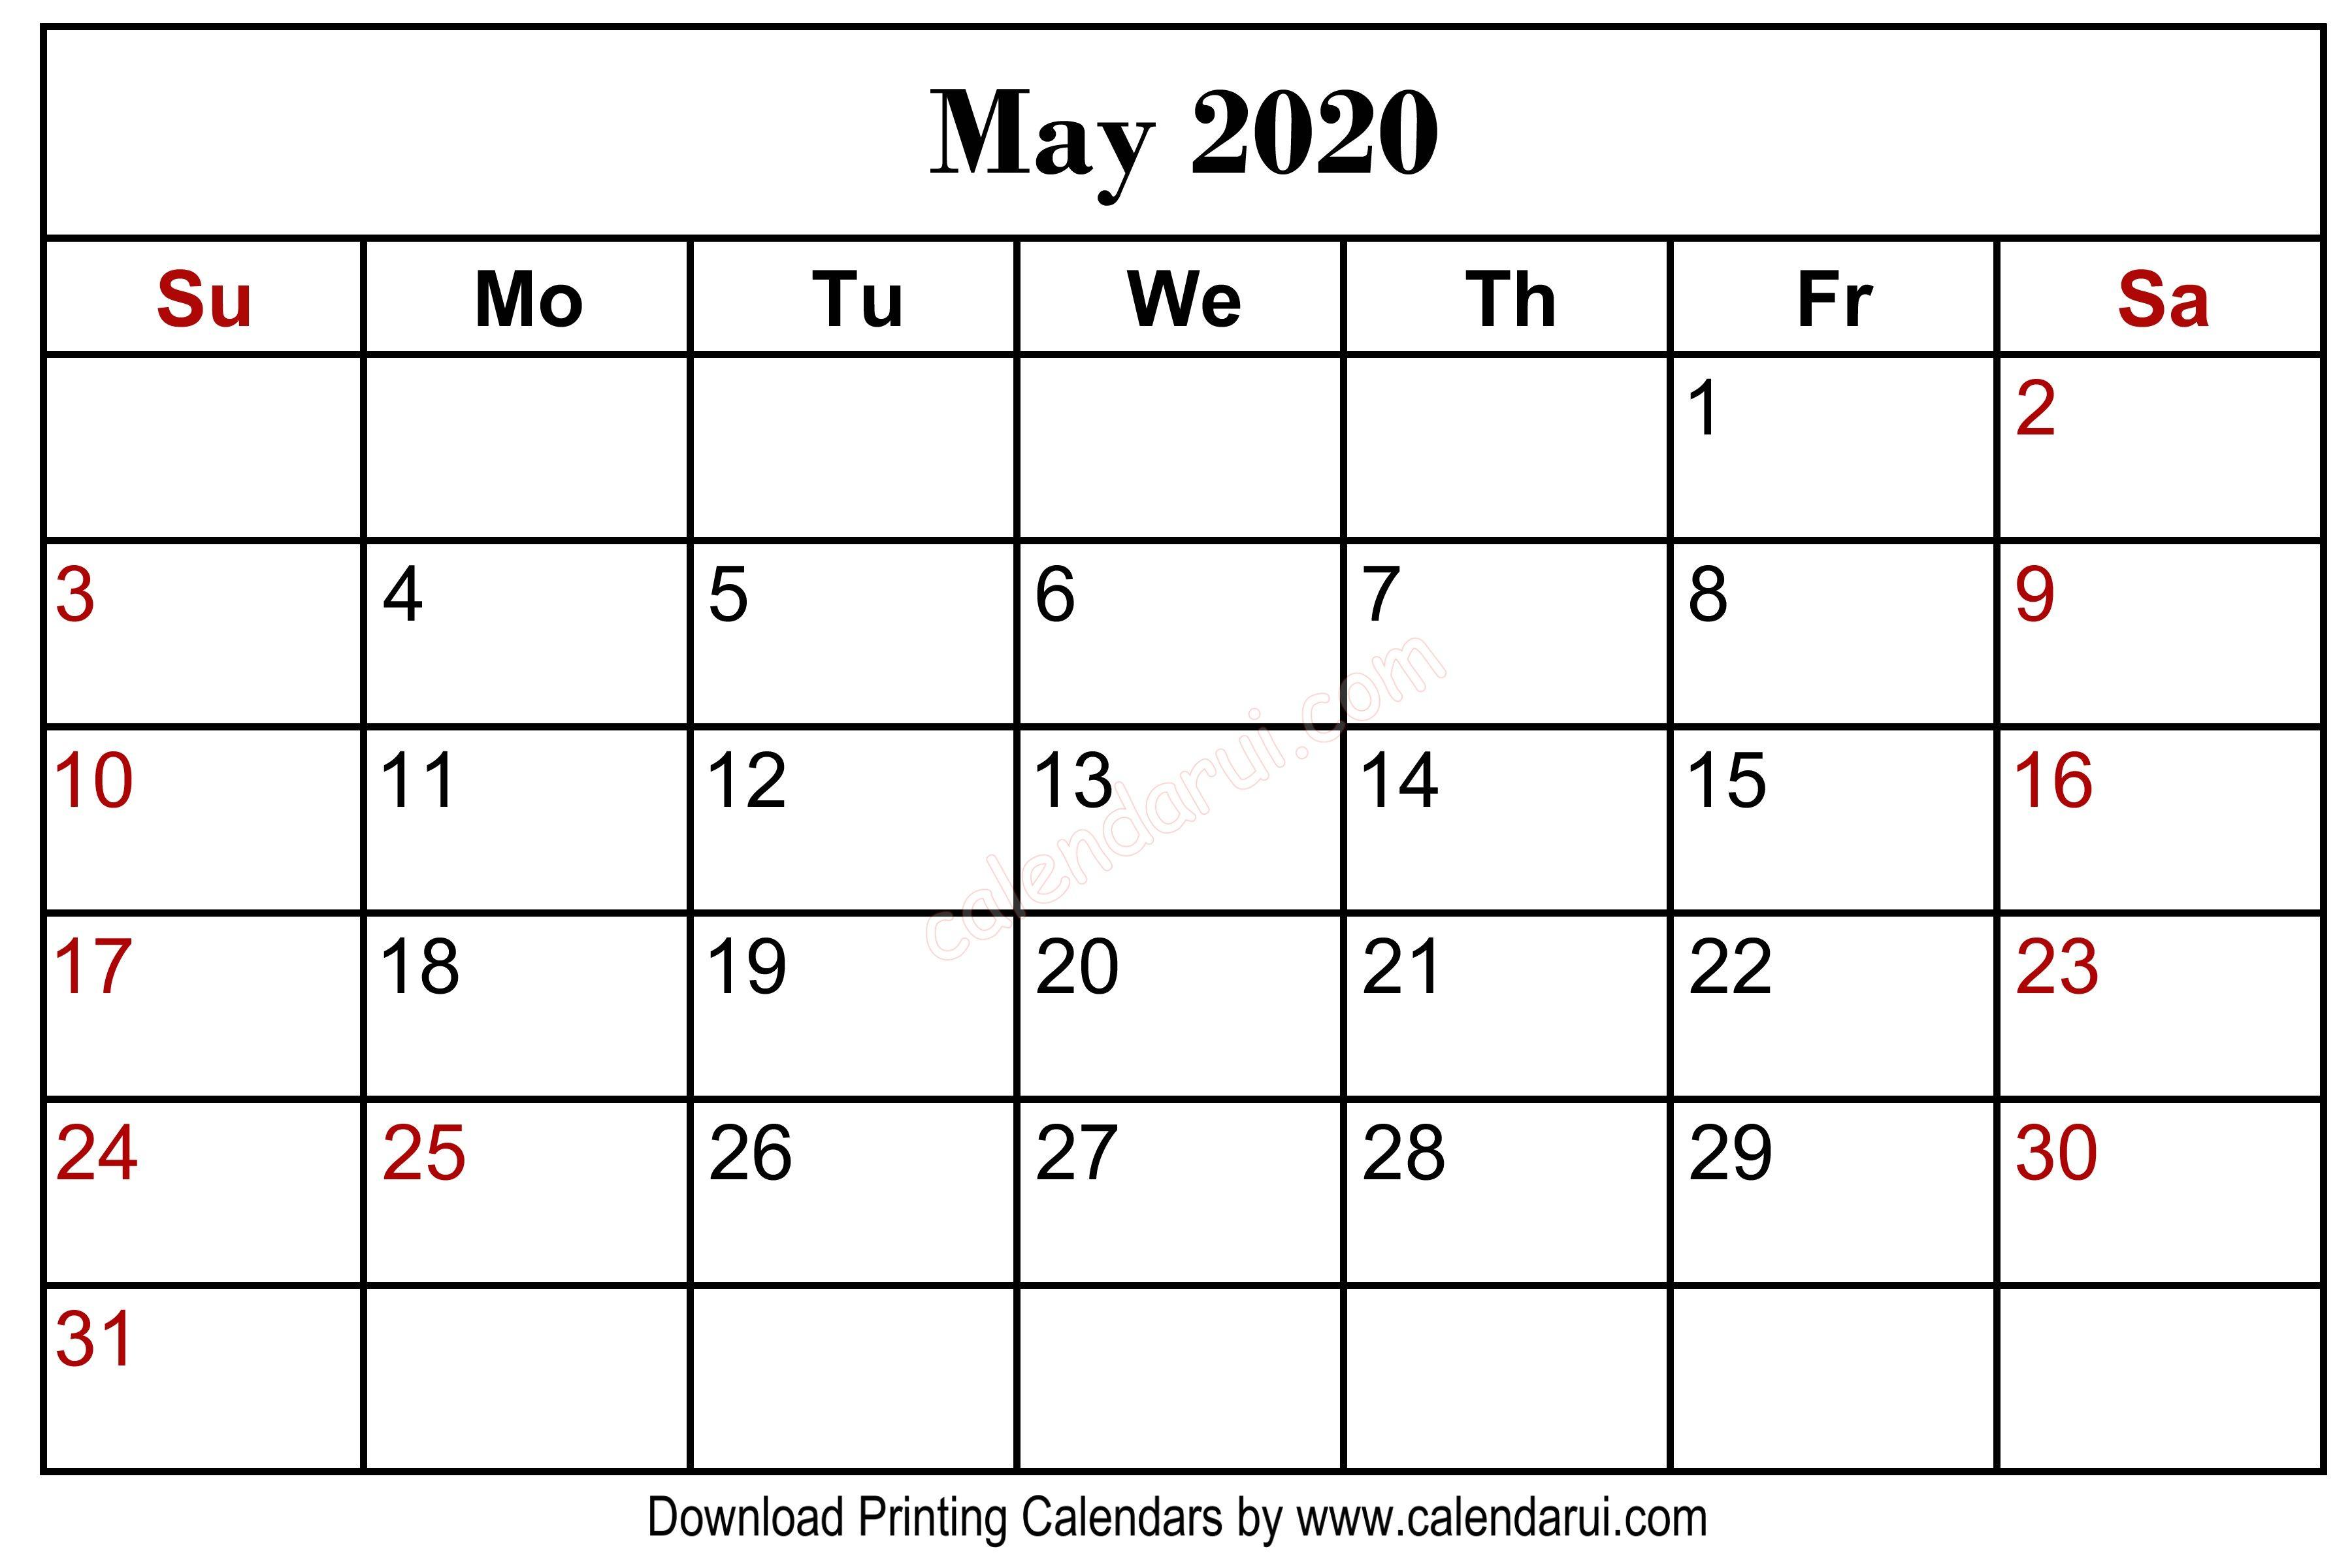 May 2020 Blank Calendar Printable Free Download Centre regarding Kalnirnay May 2020